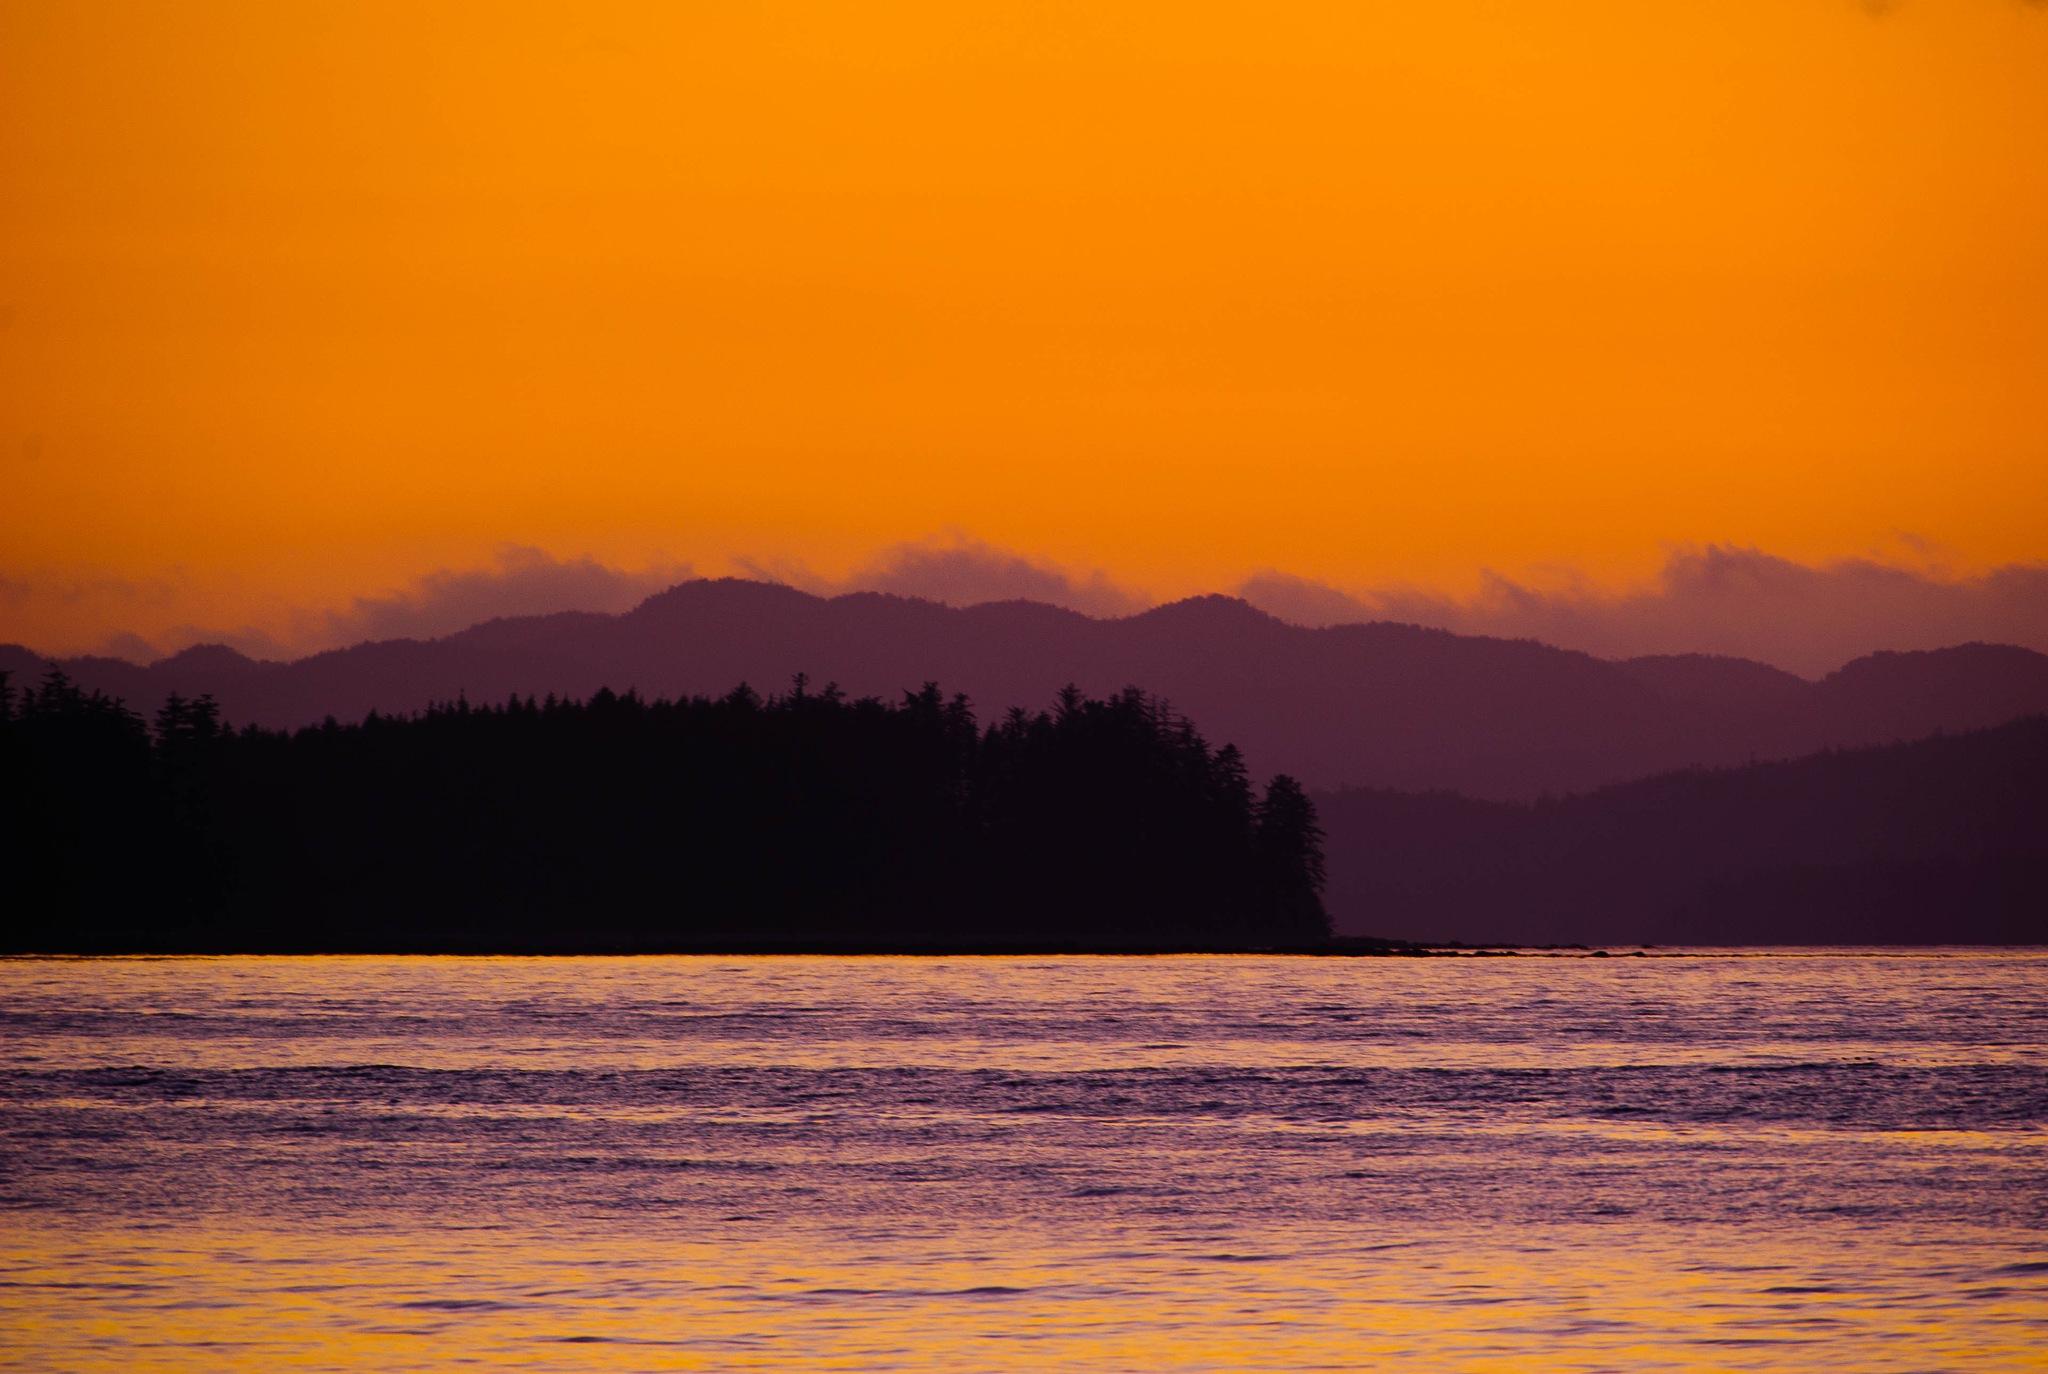 dusk on Vancouver Island Canada by jkirkphotography.com